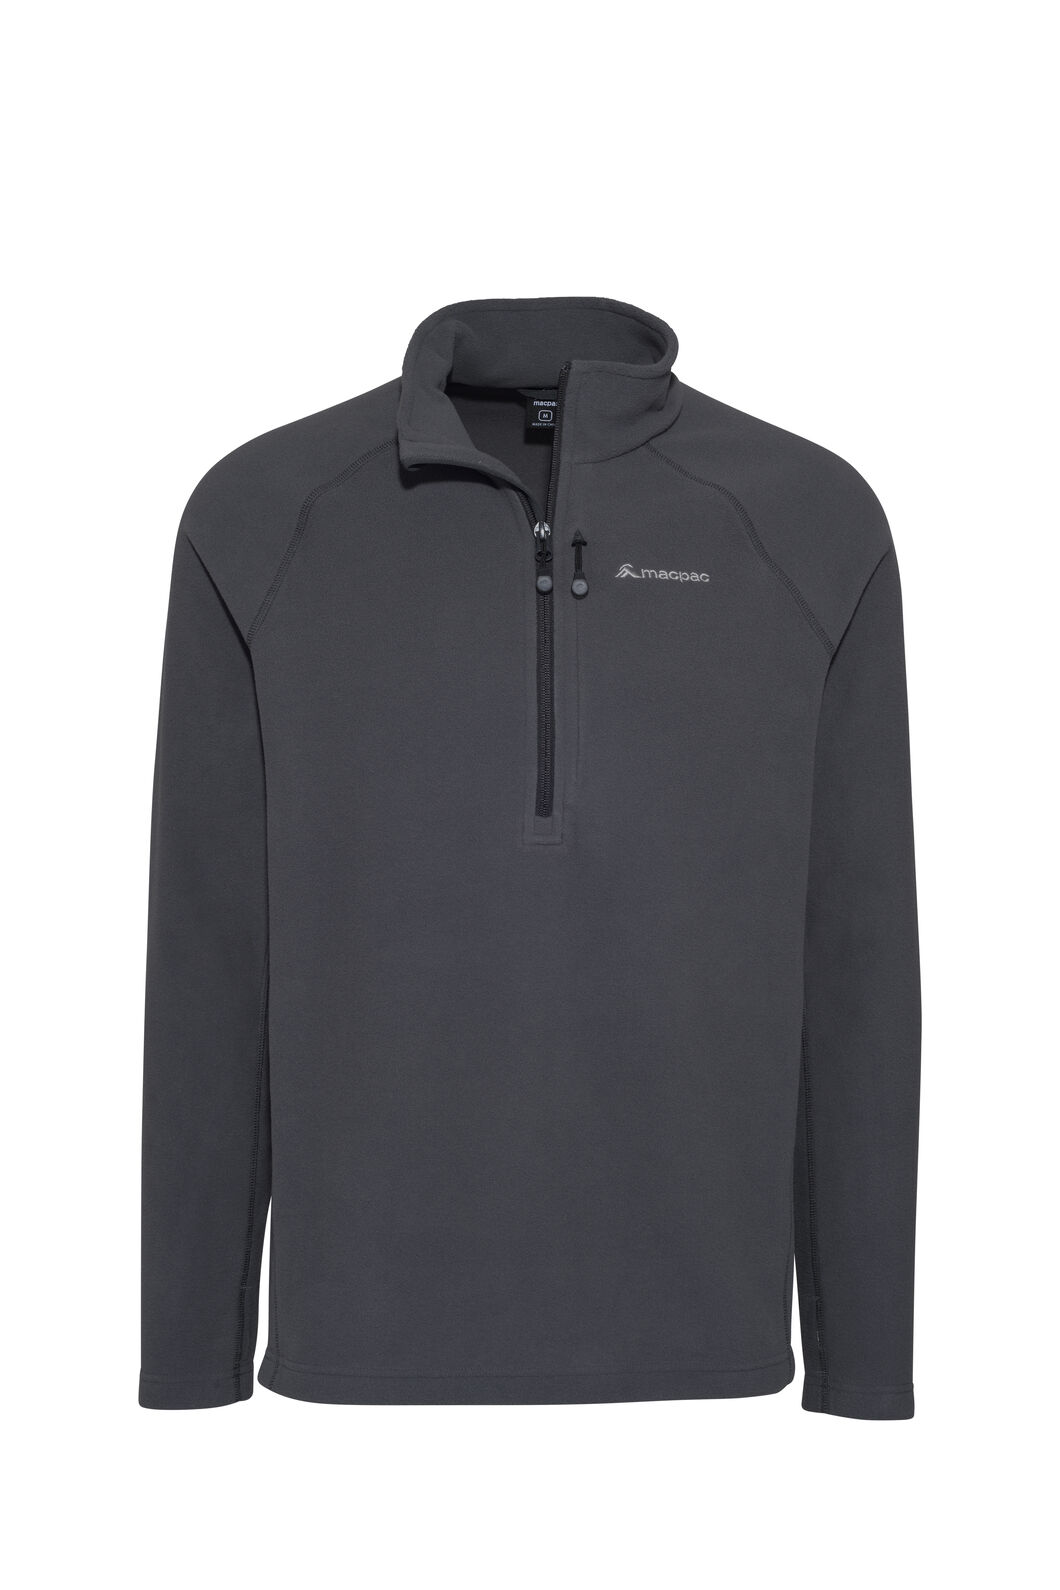 Macpac Tui Polartec® Micro Fleece® Pullover — Men's, Iron Gate, hi-res